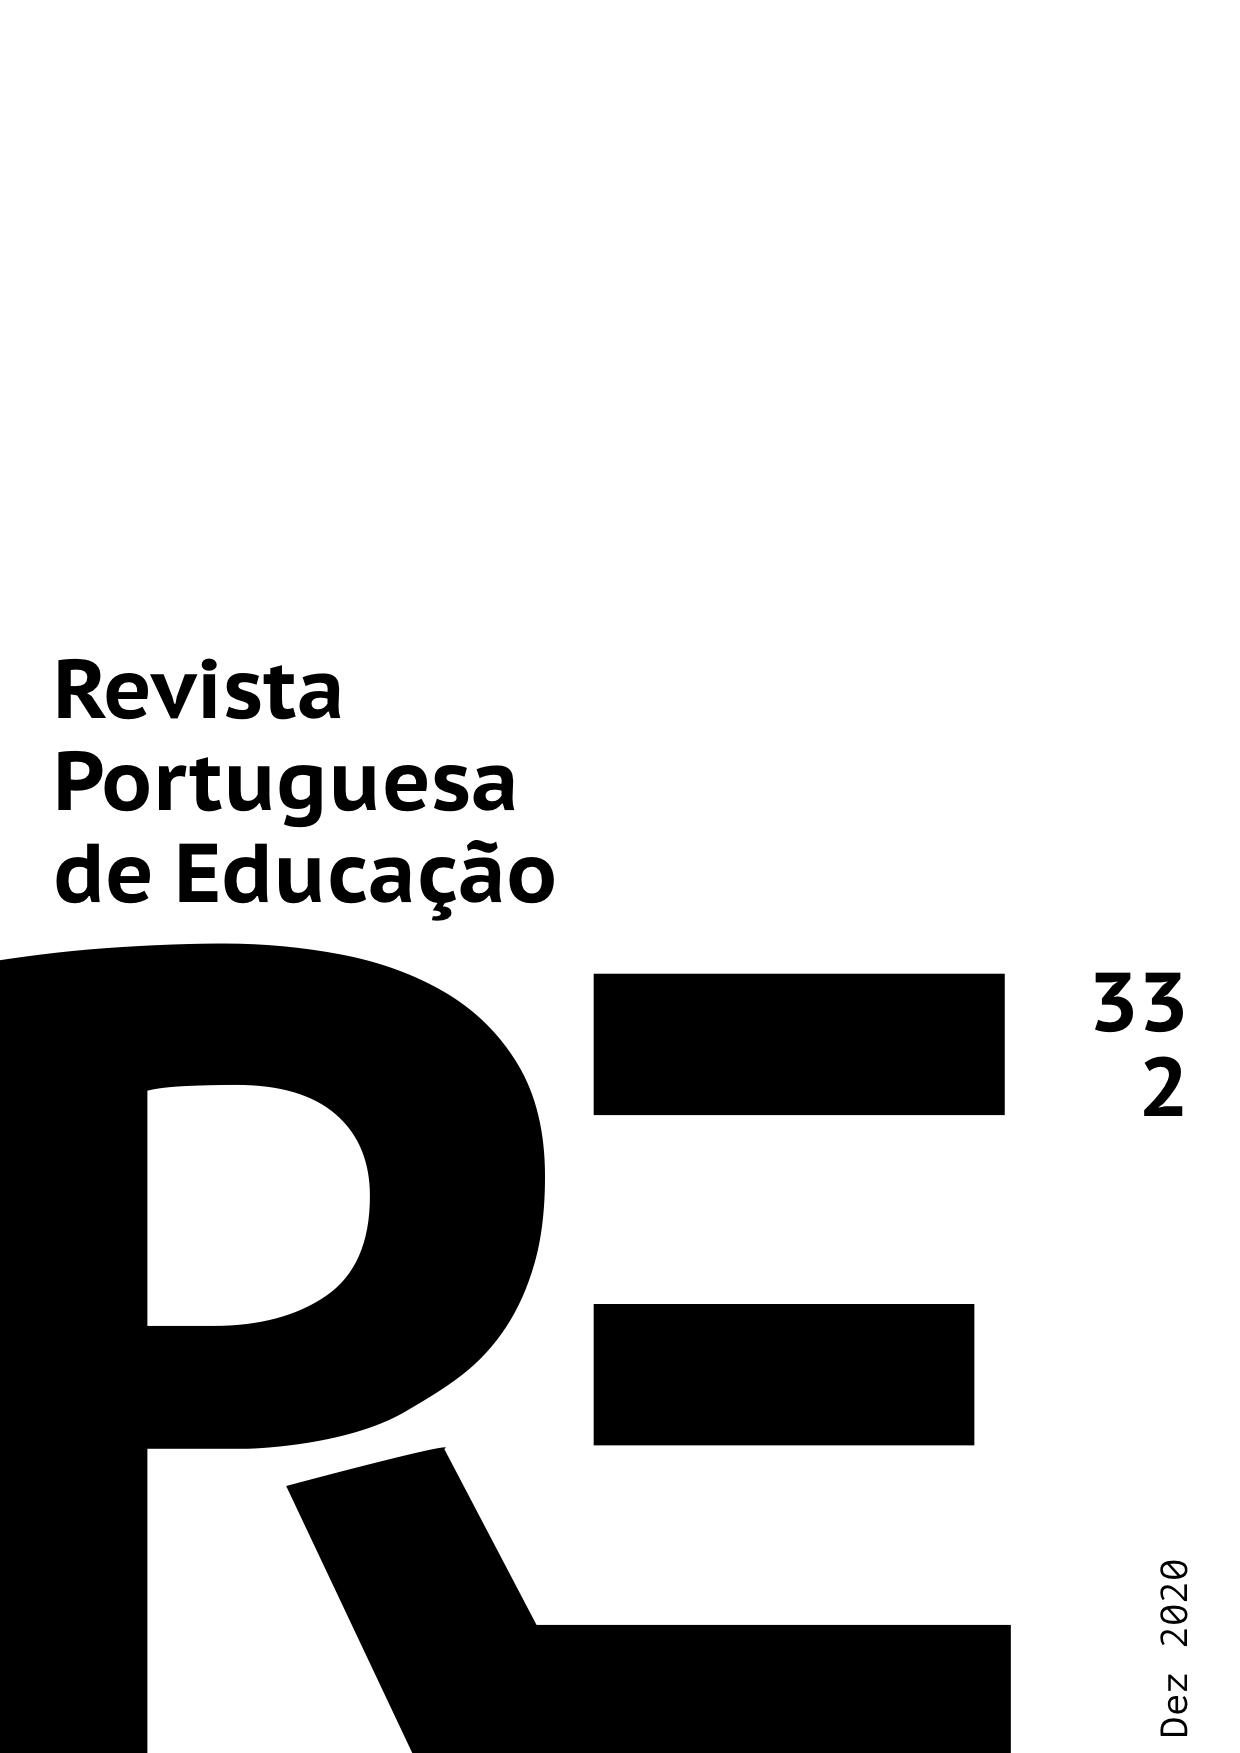 Ver Vol. 33 N.º 2 (2020)